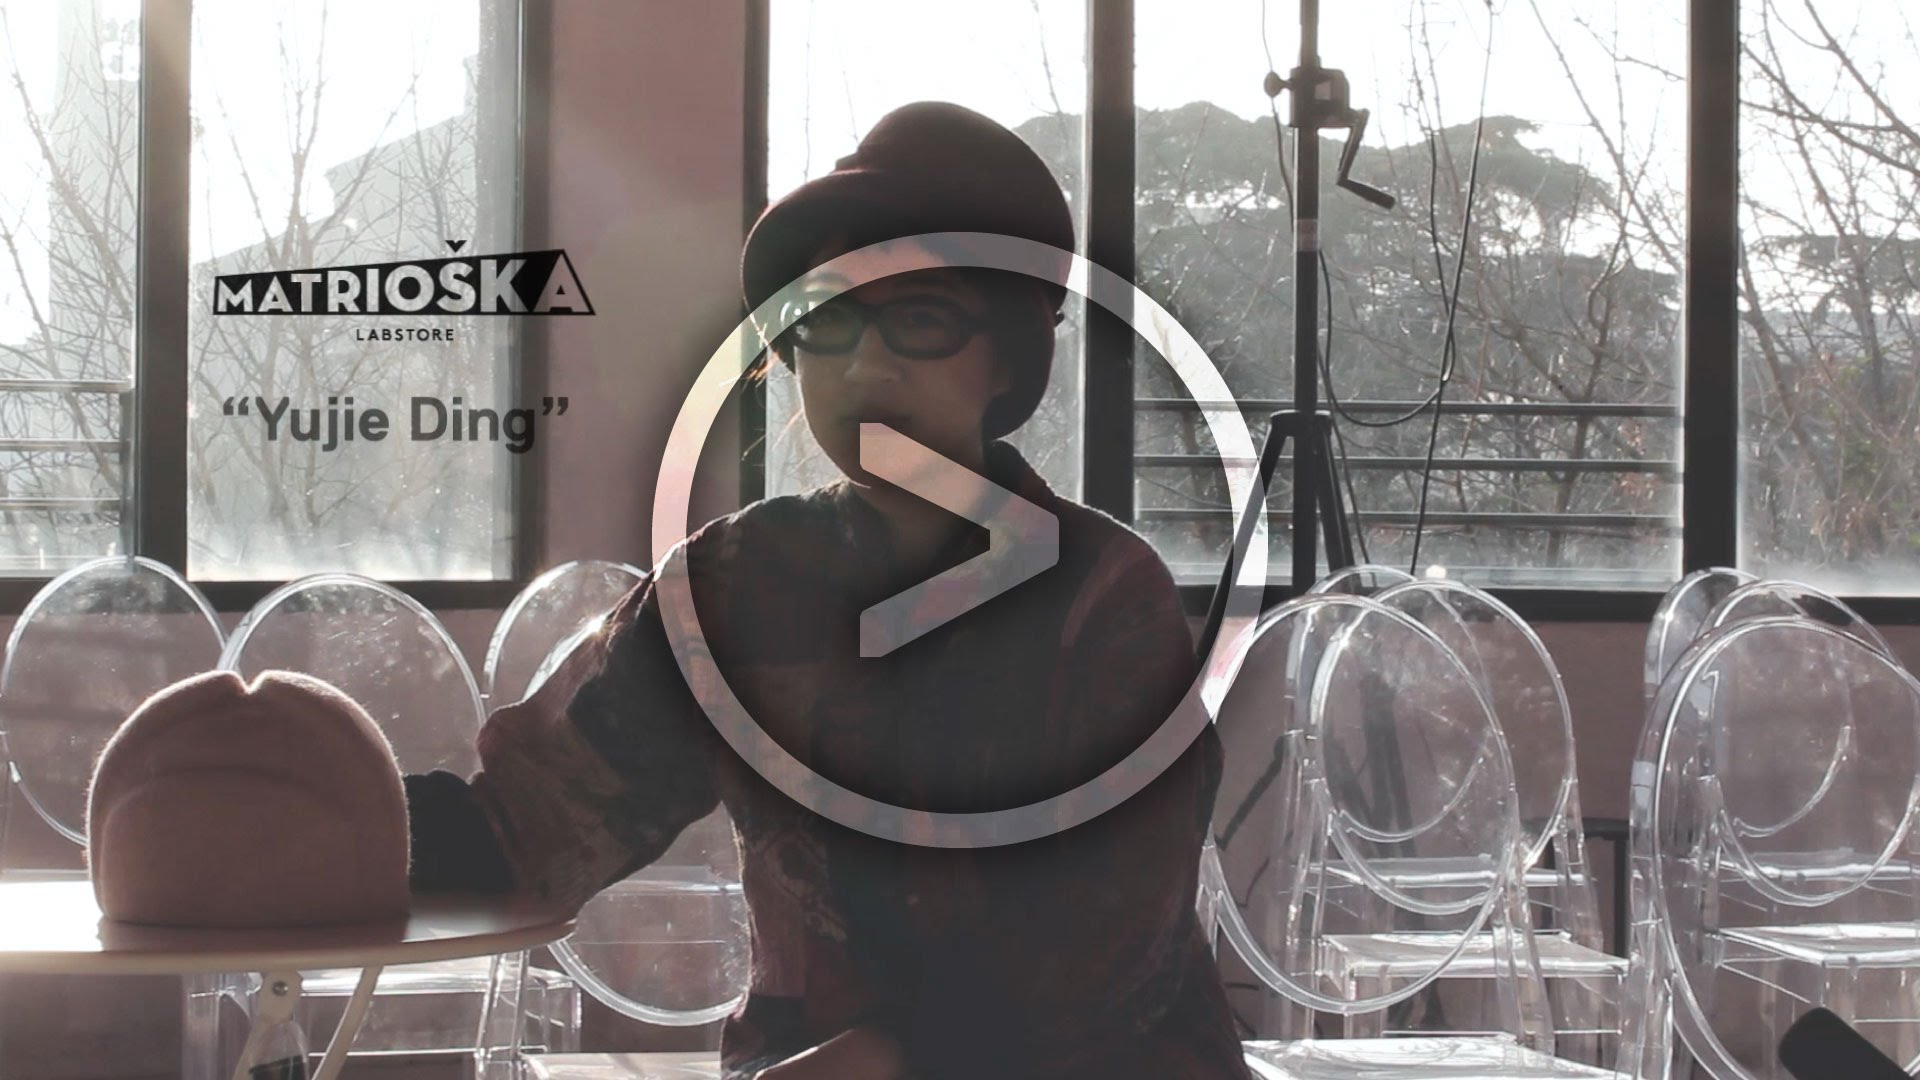 I cappelli come oggetti d'arte / Yujie Ding si racconta a Matrioška